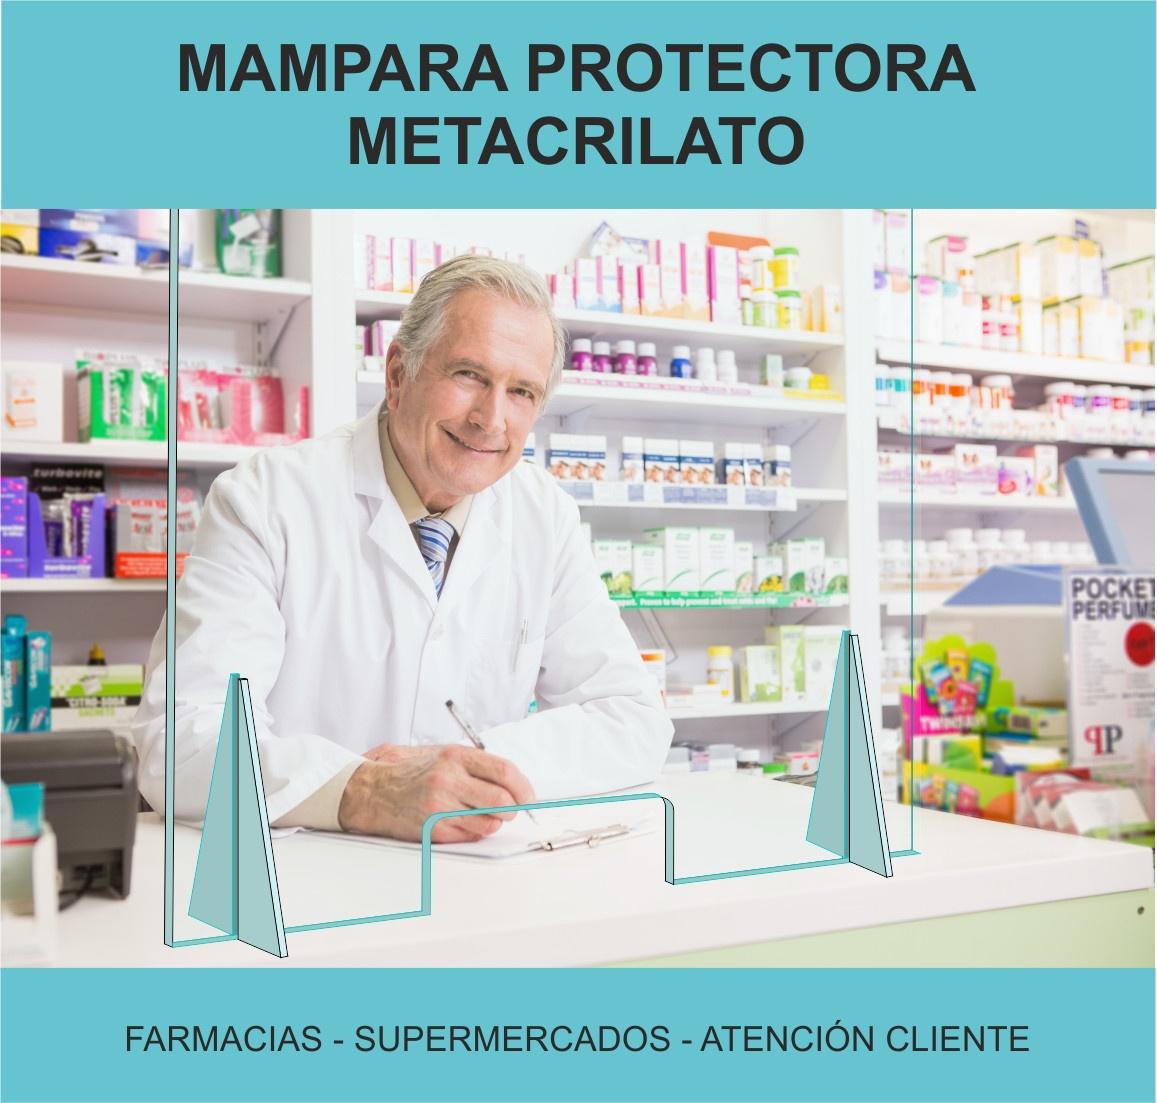 Mamparas de protección de metacrilato para farmacias